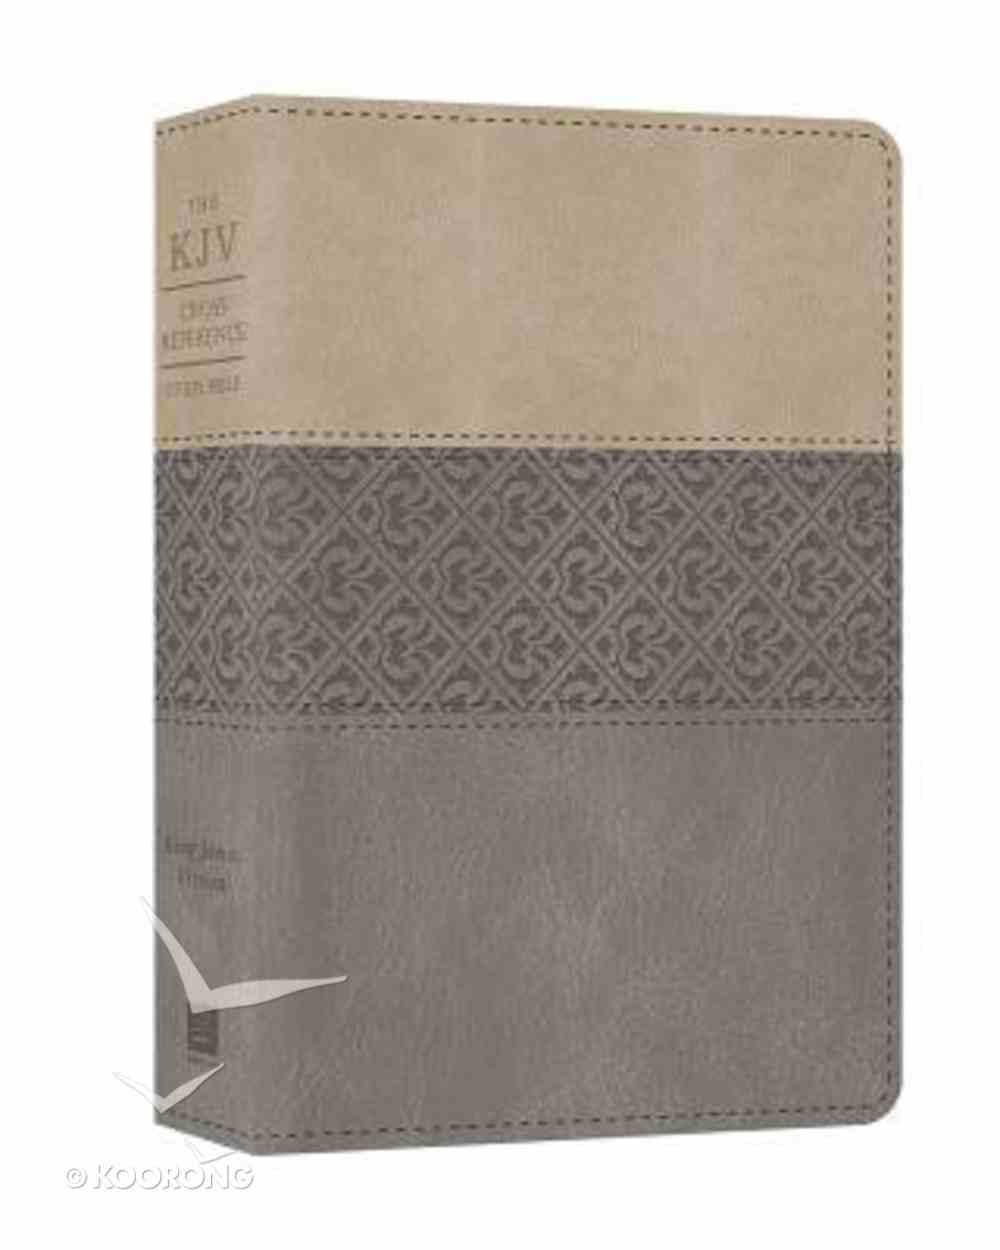 KJV Cross Reference Study Bible (Gray) Imitation Leather